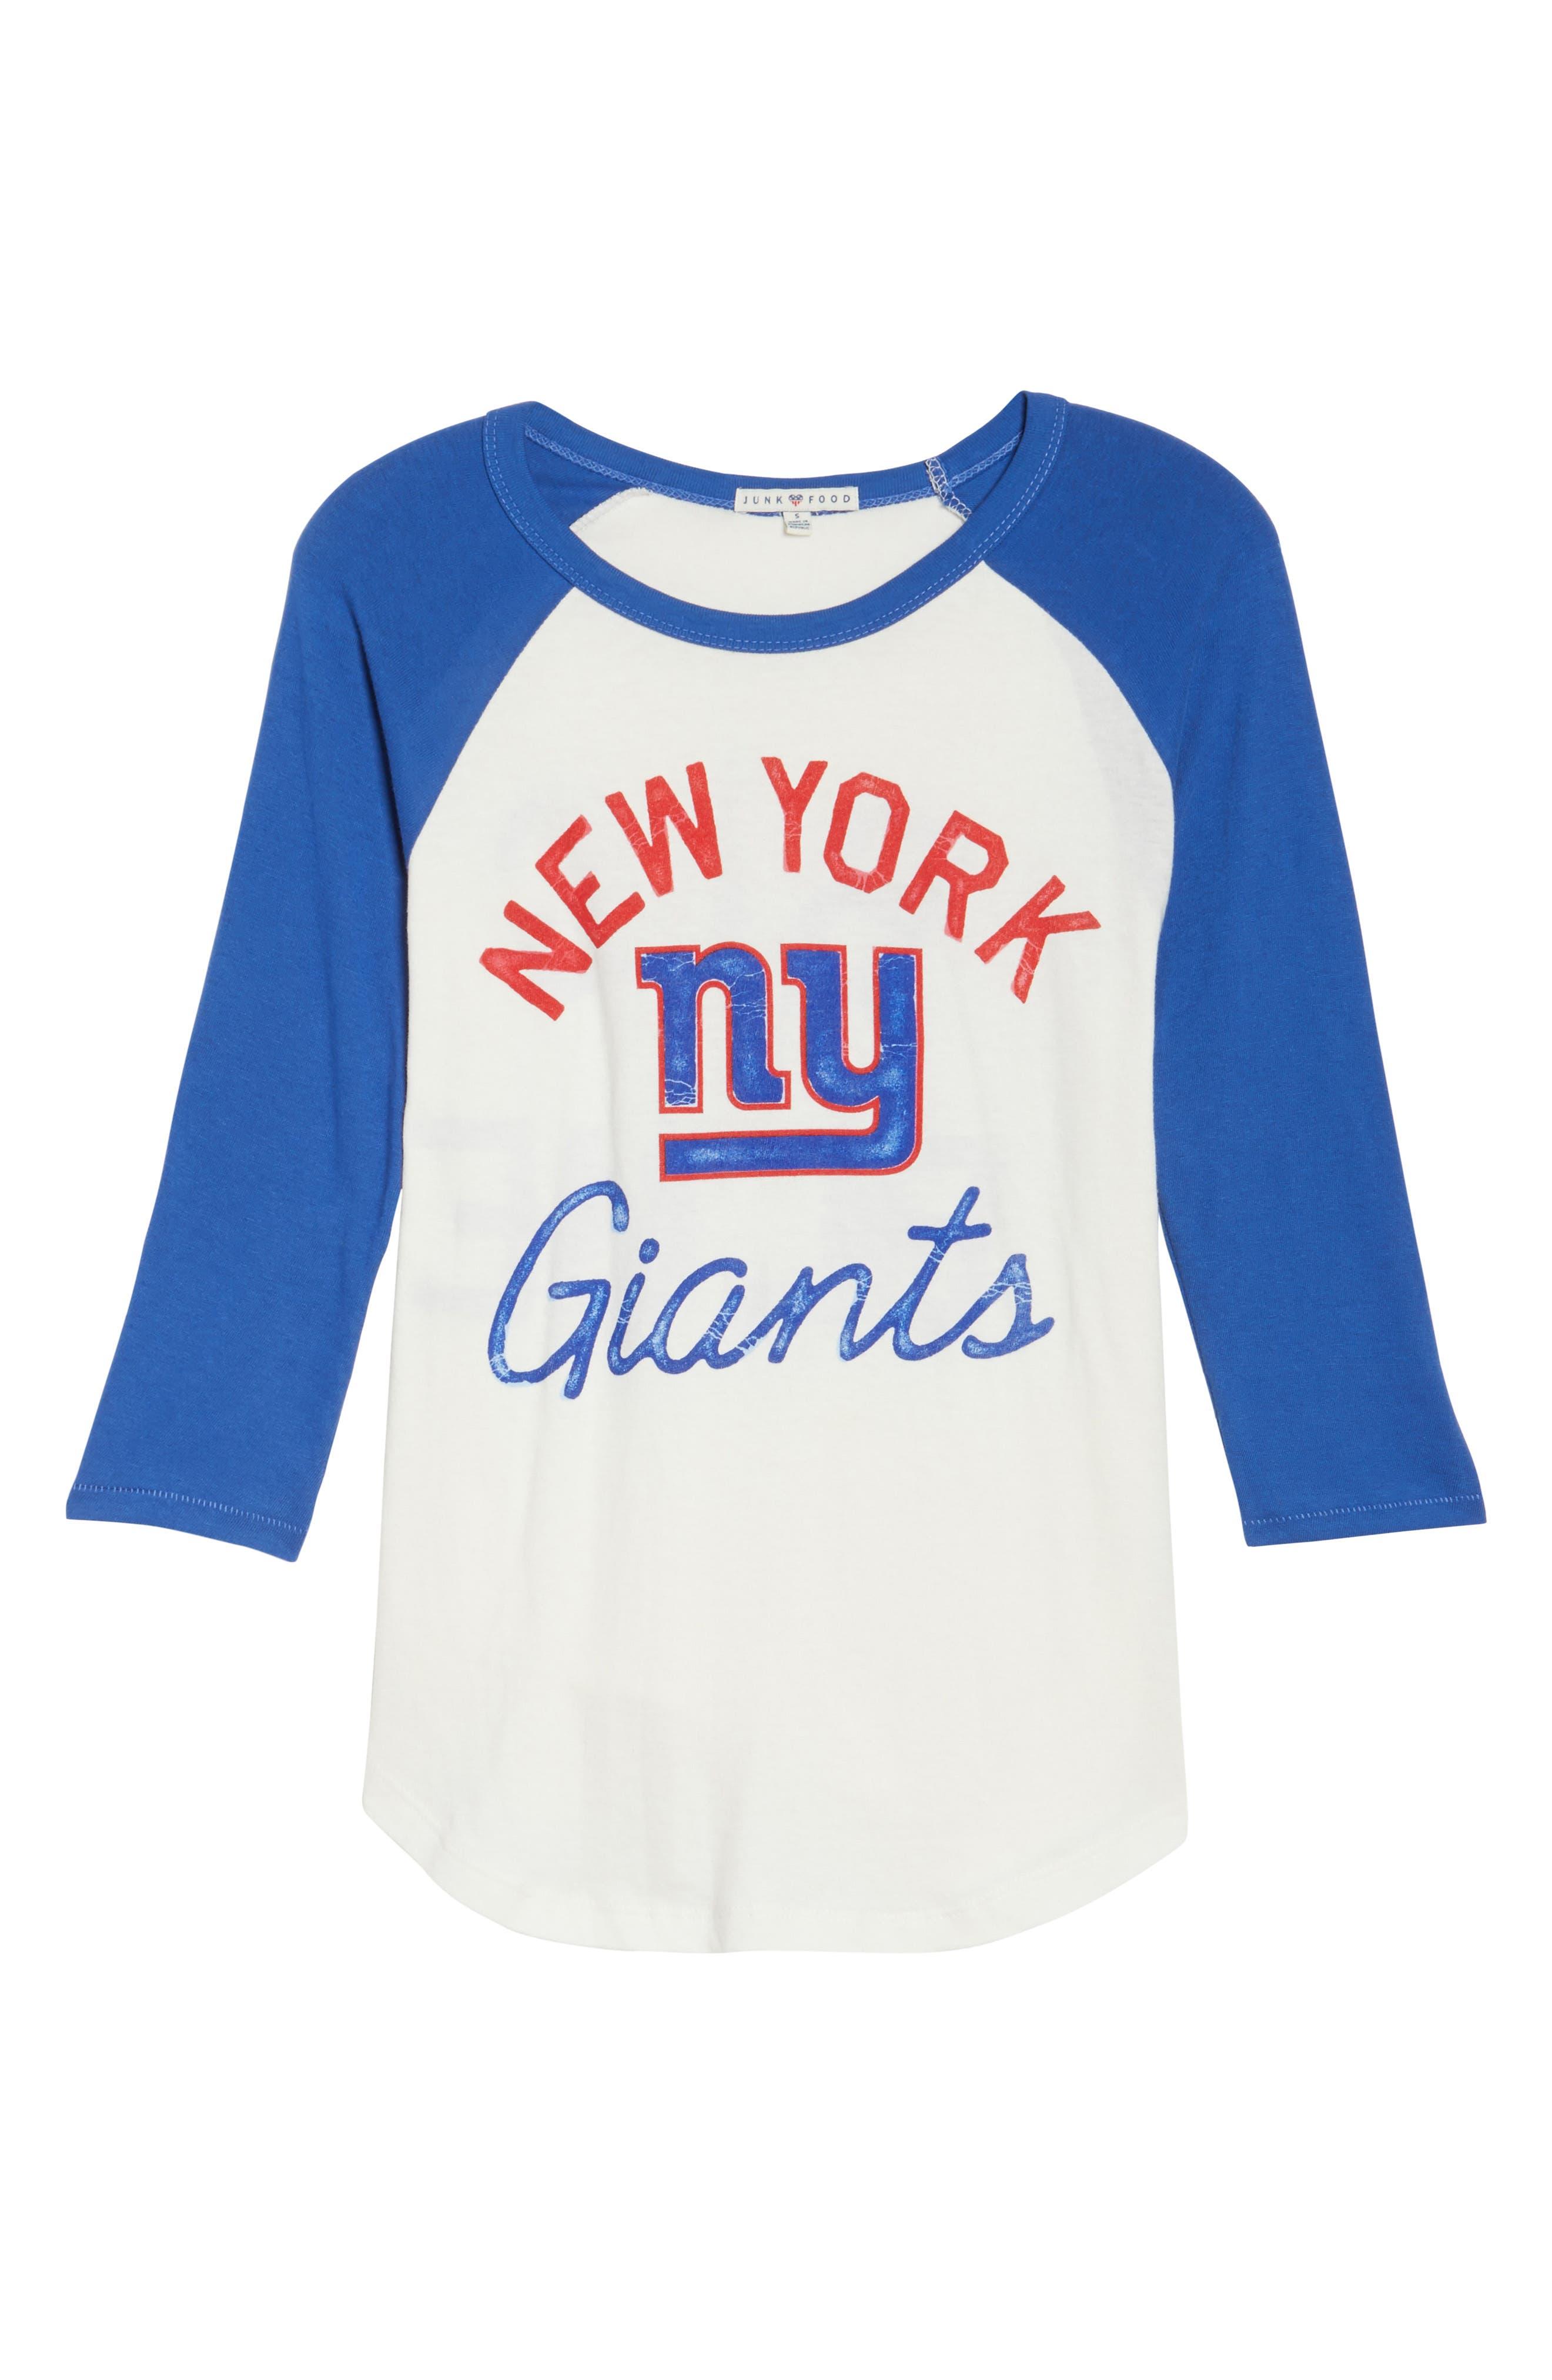 NFL New York Giants Raglan Tee,                             Alternate thumbnail 6, color,                             189